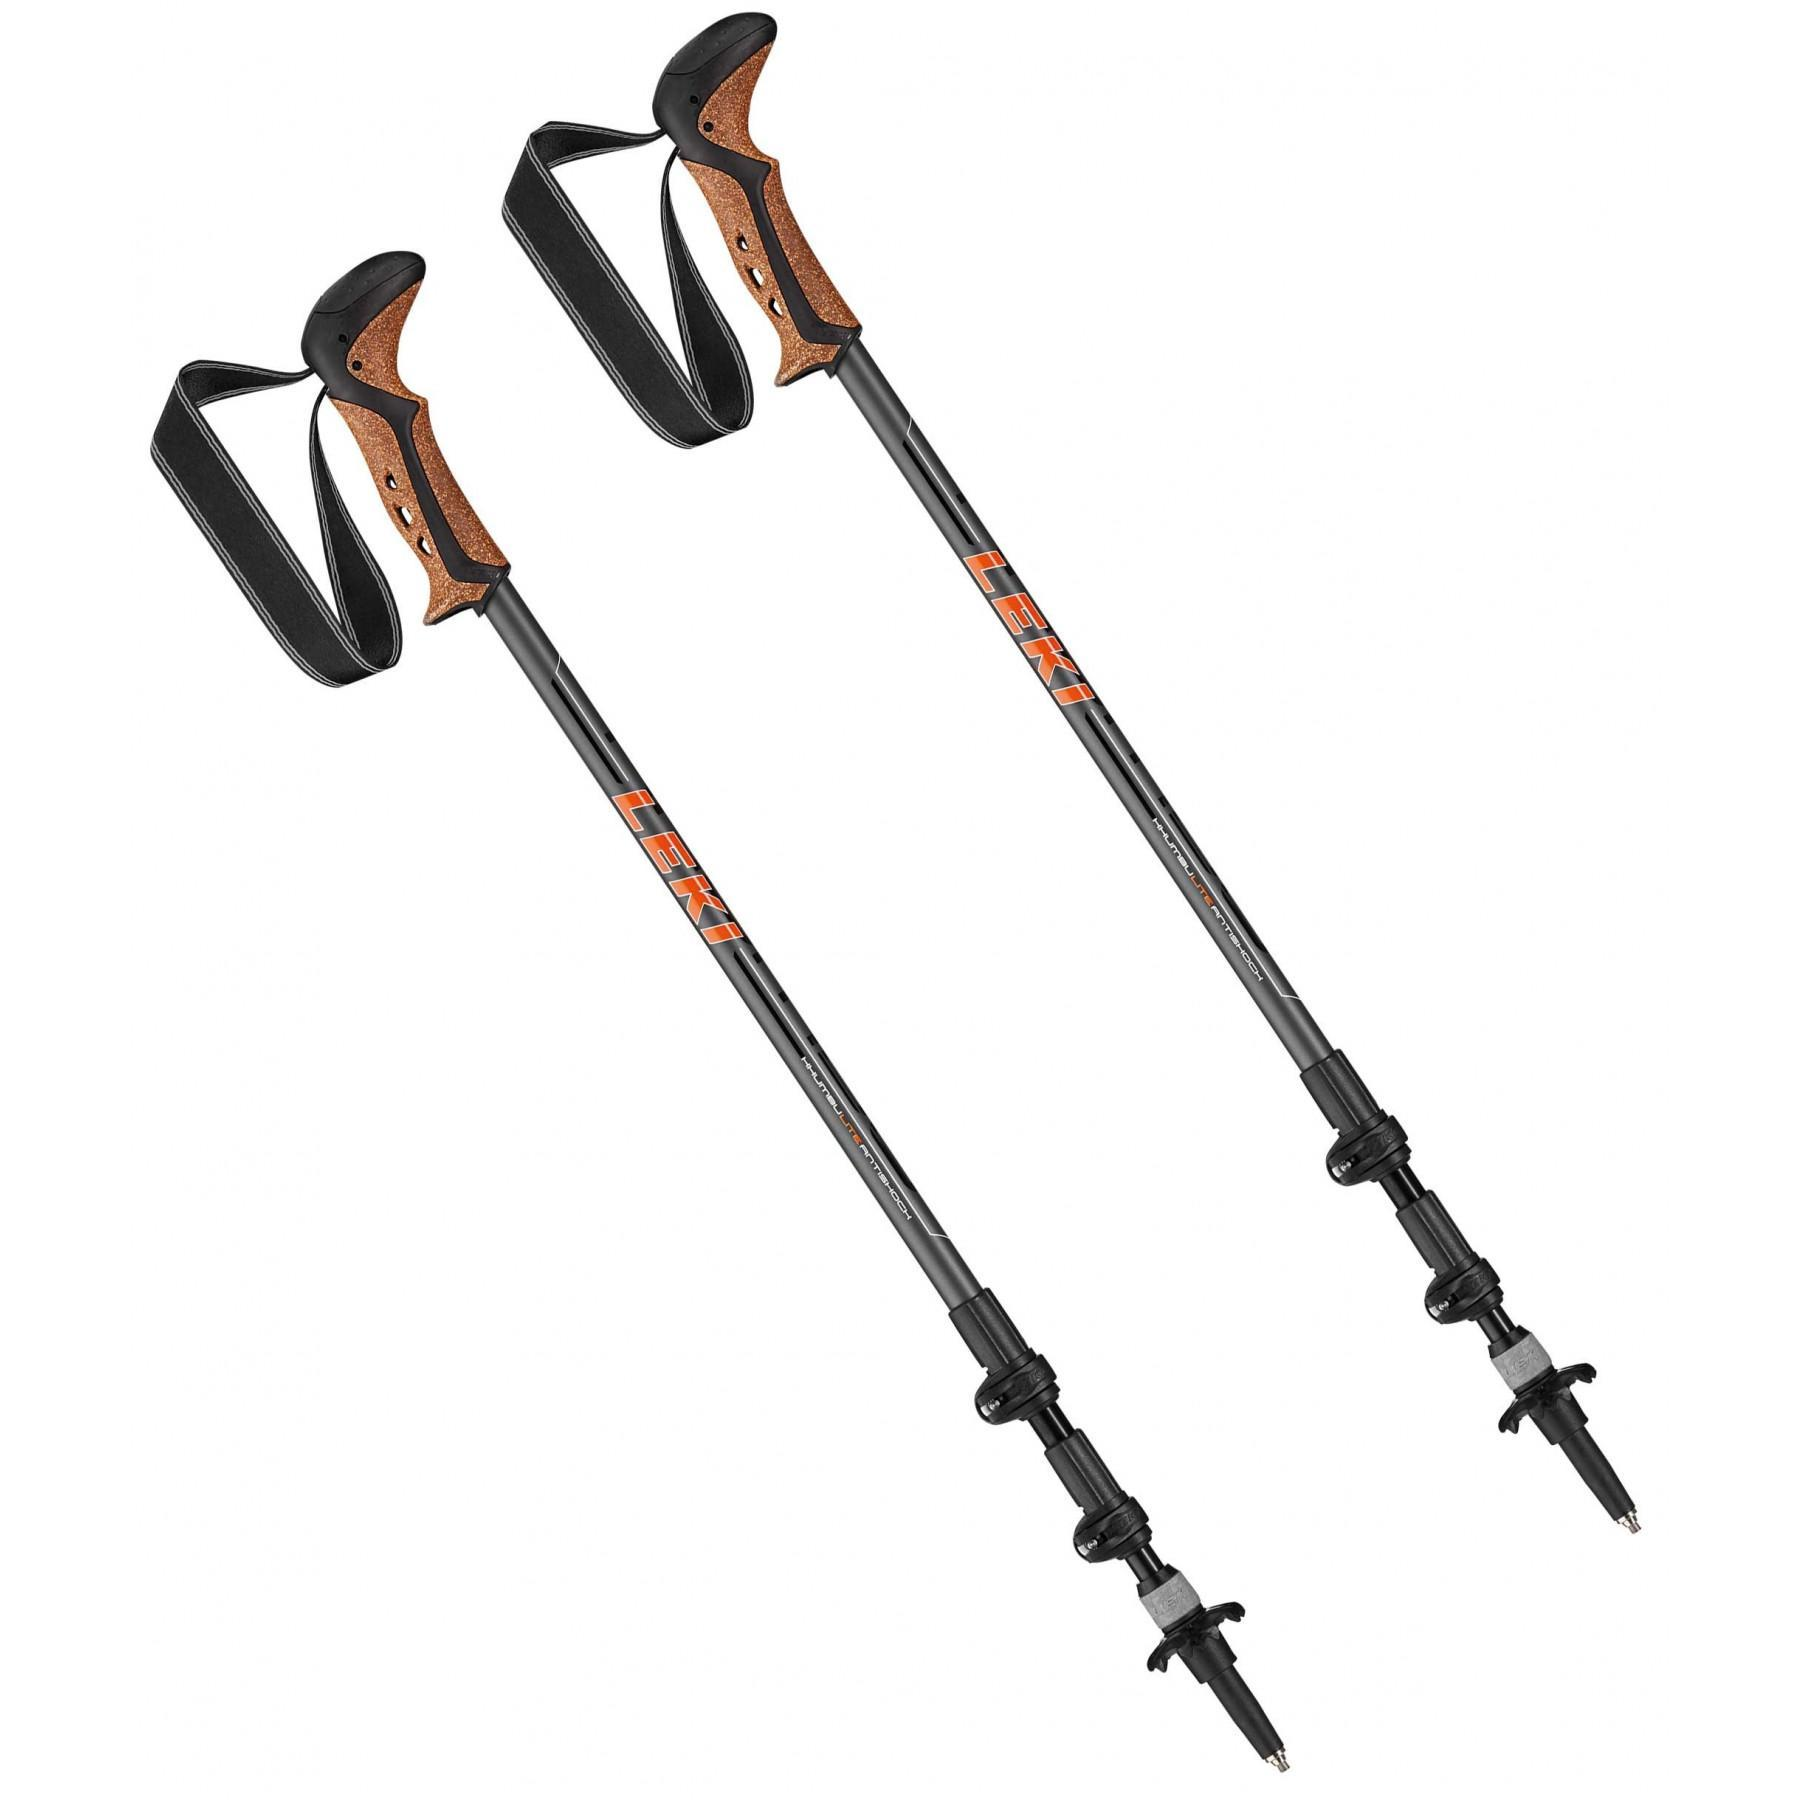 Leki Khumbu Lite 100/135 cm hiking poles